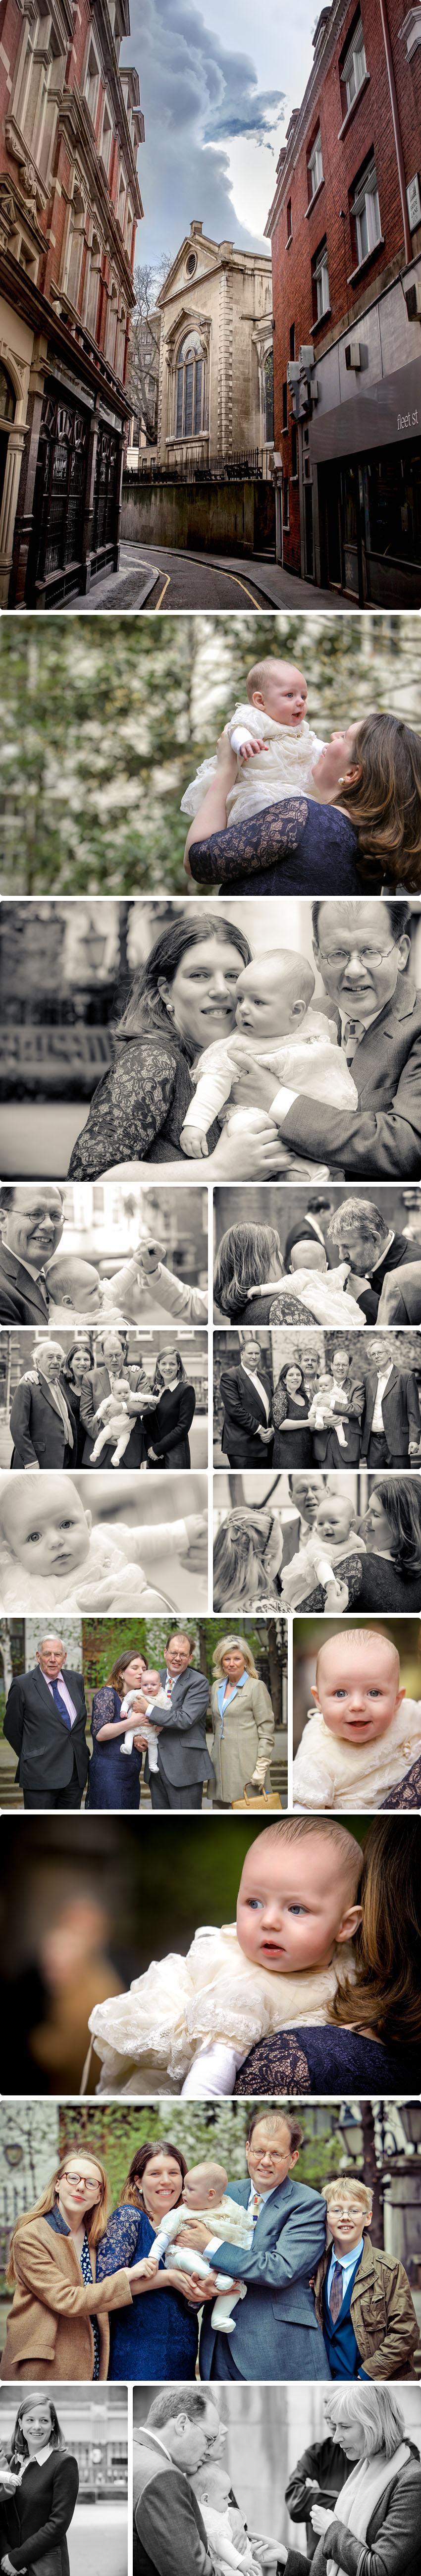 Outdoor snapshots of little Jasper's family